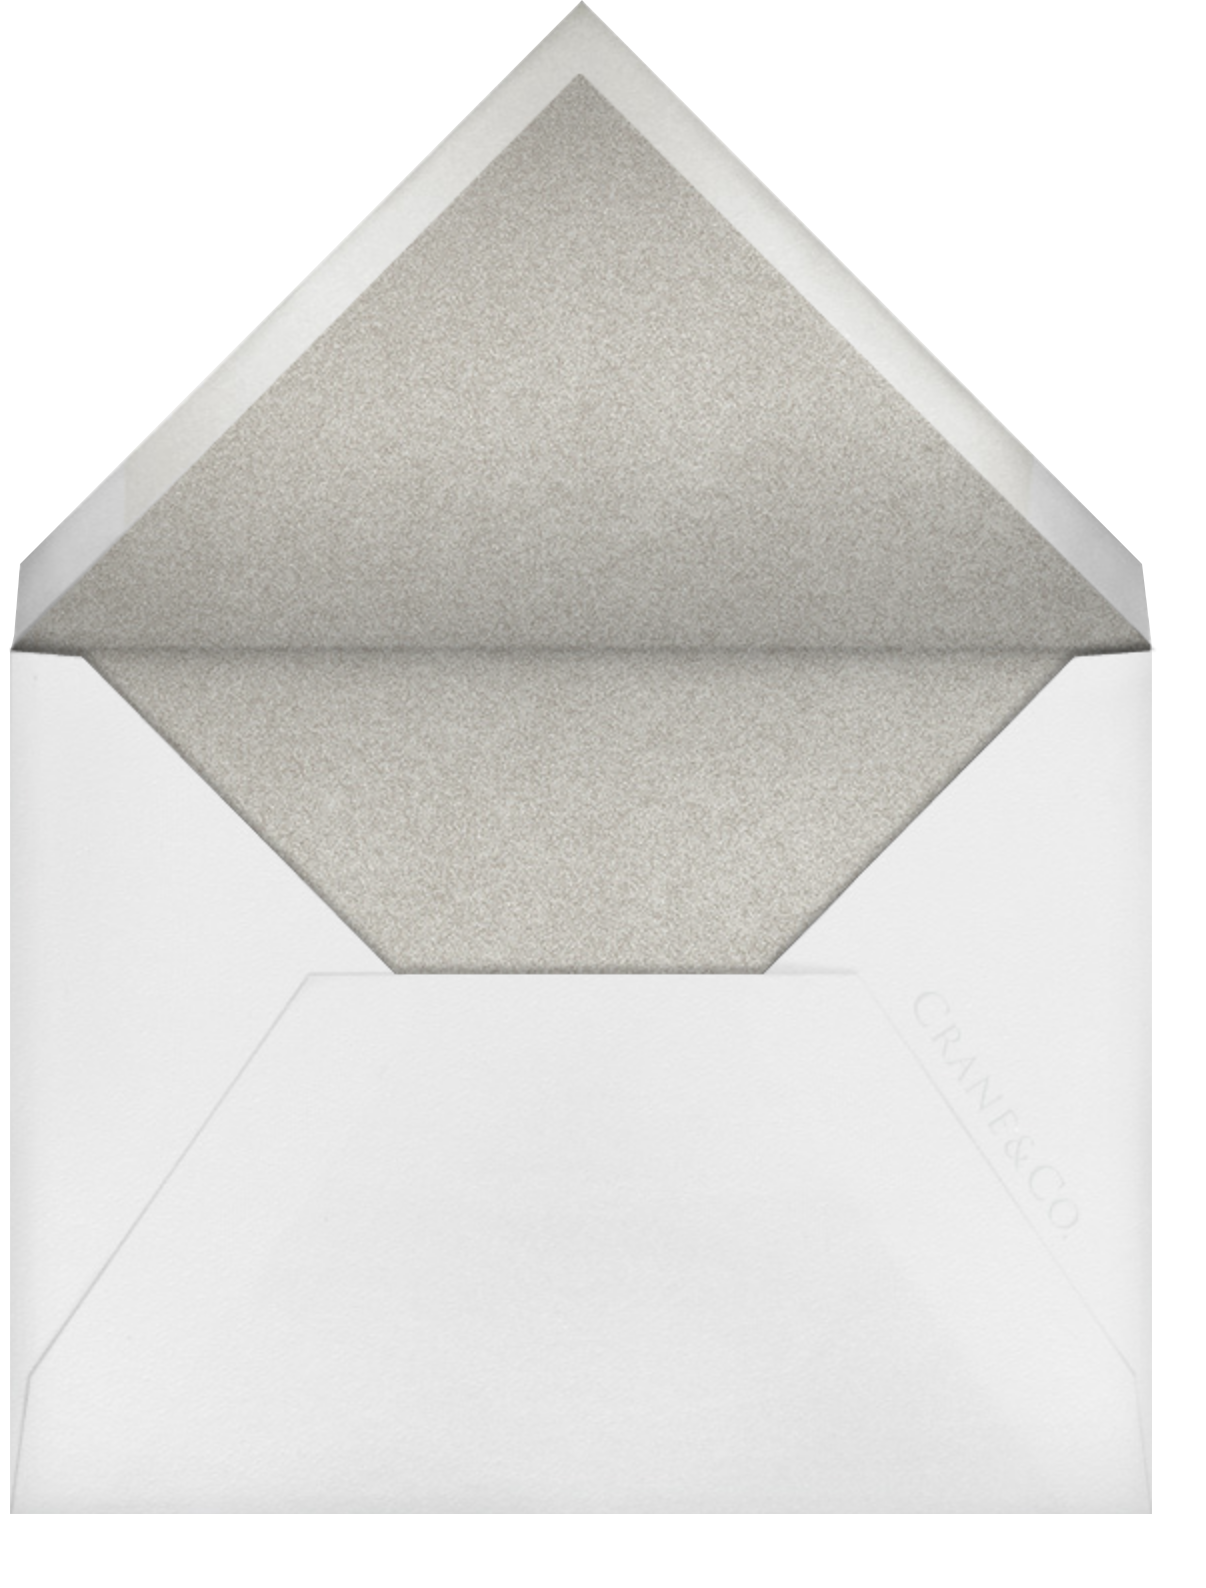 Soirée (Save the Date) - Platinum - Kelly Wearstler - null - envelope back